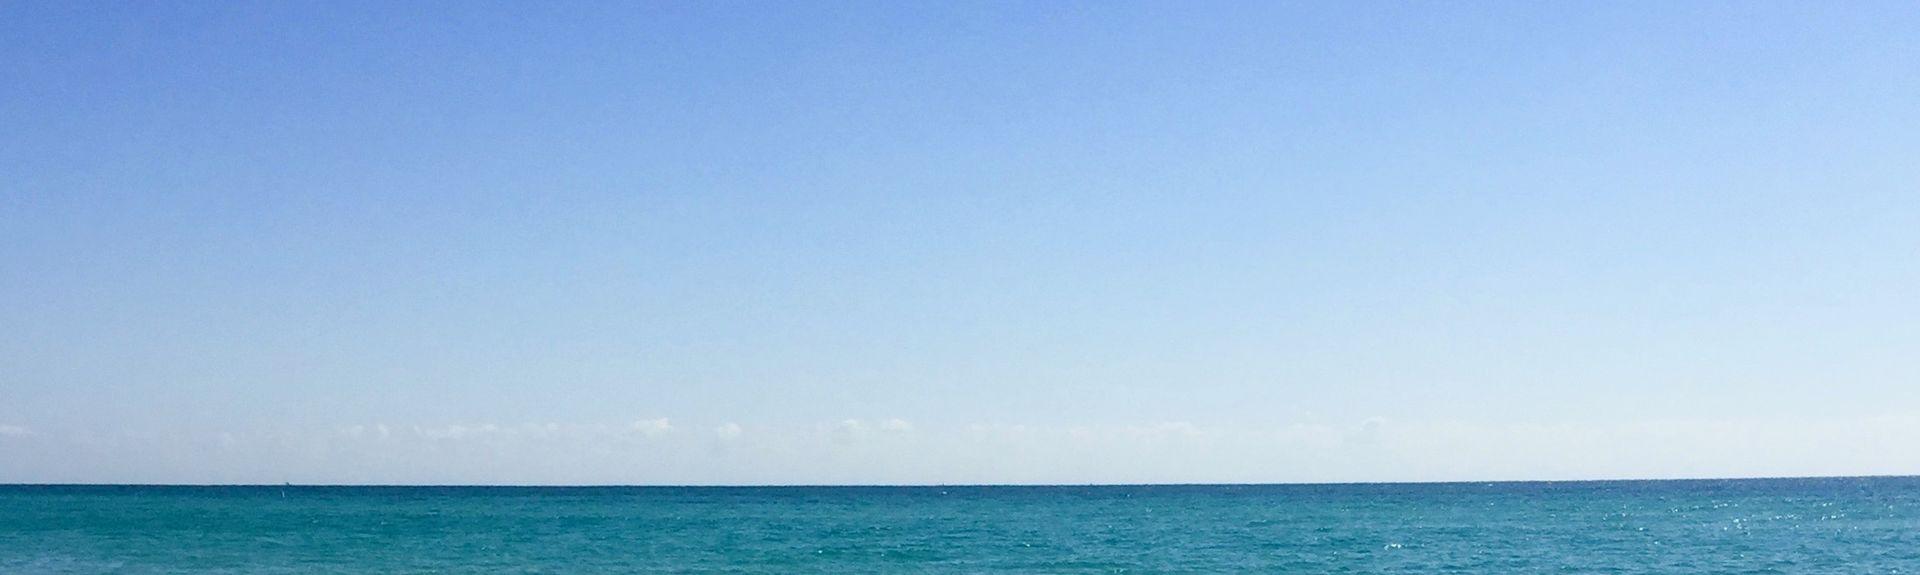 Ocean Reserve, Sunny Isle Beach, FL, USA